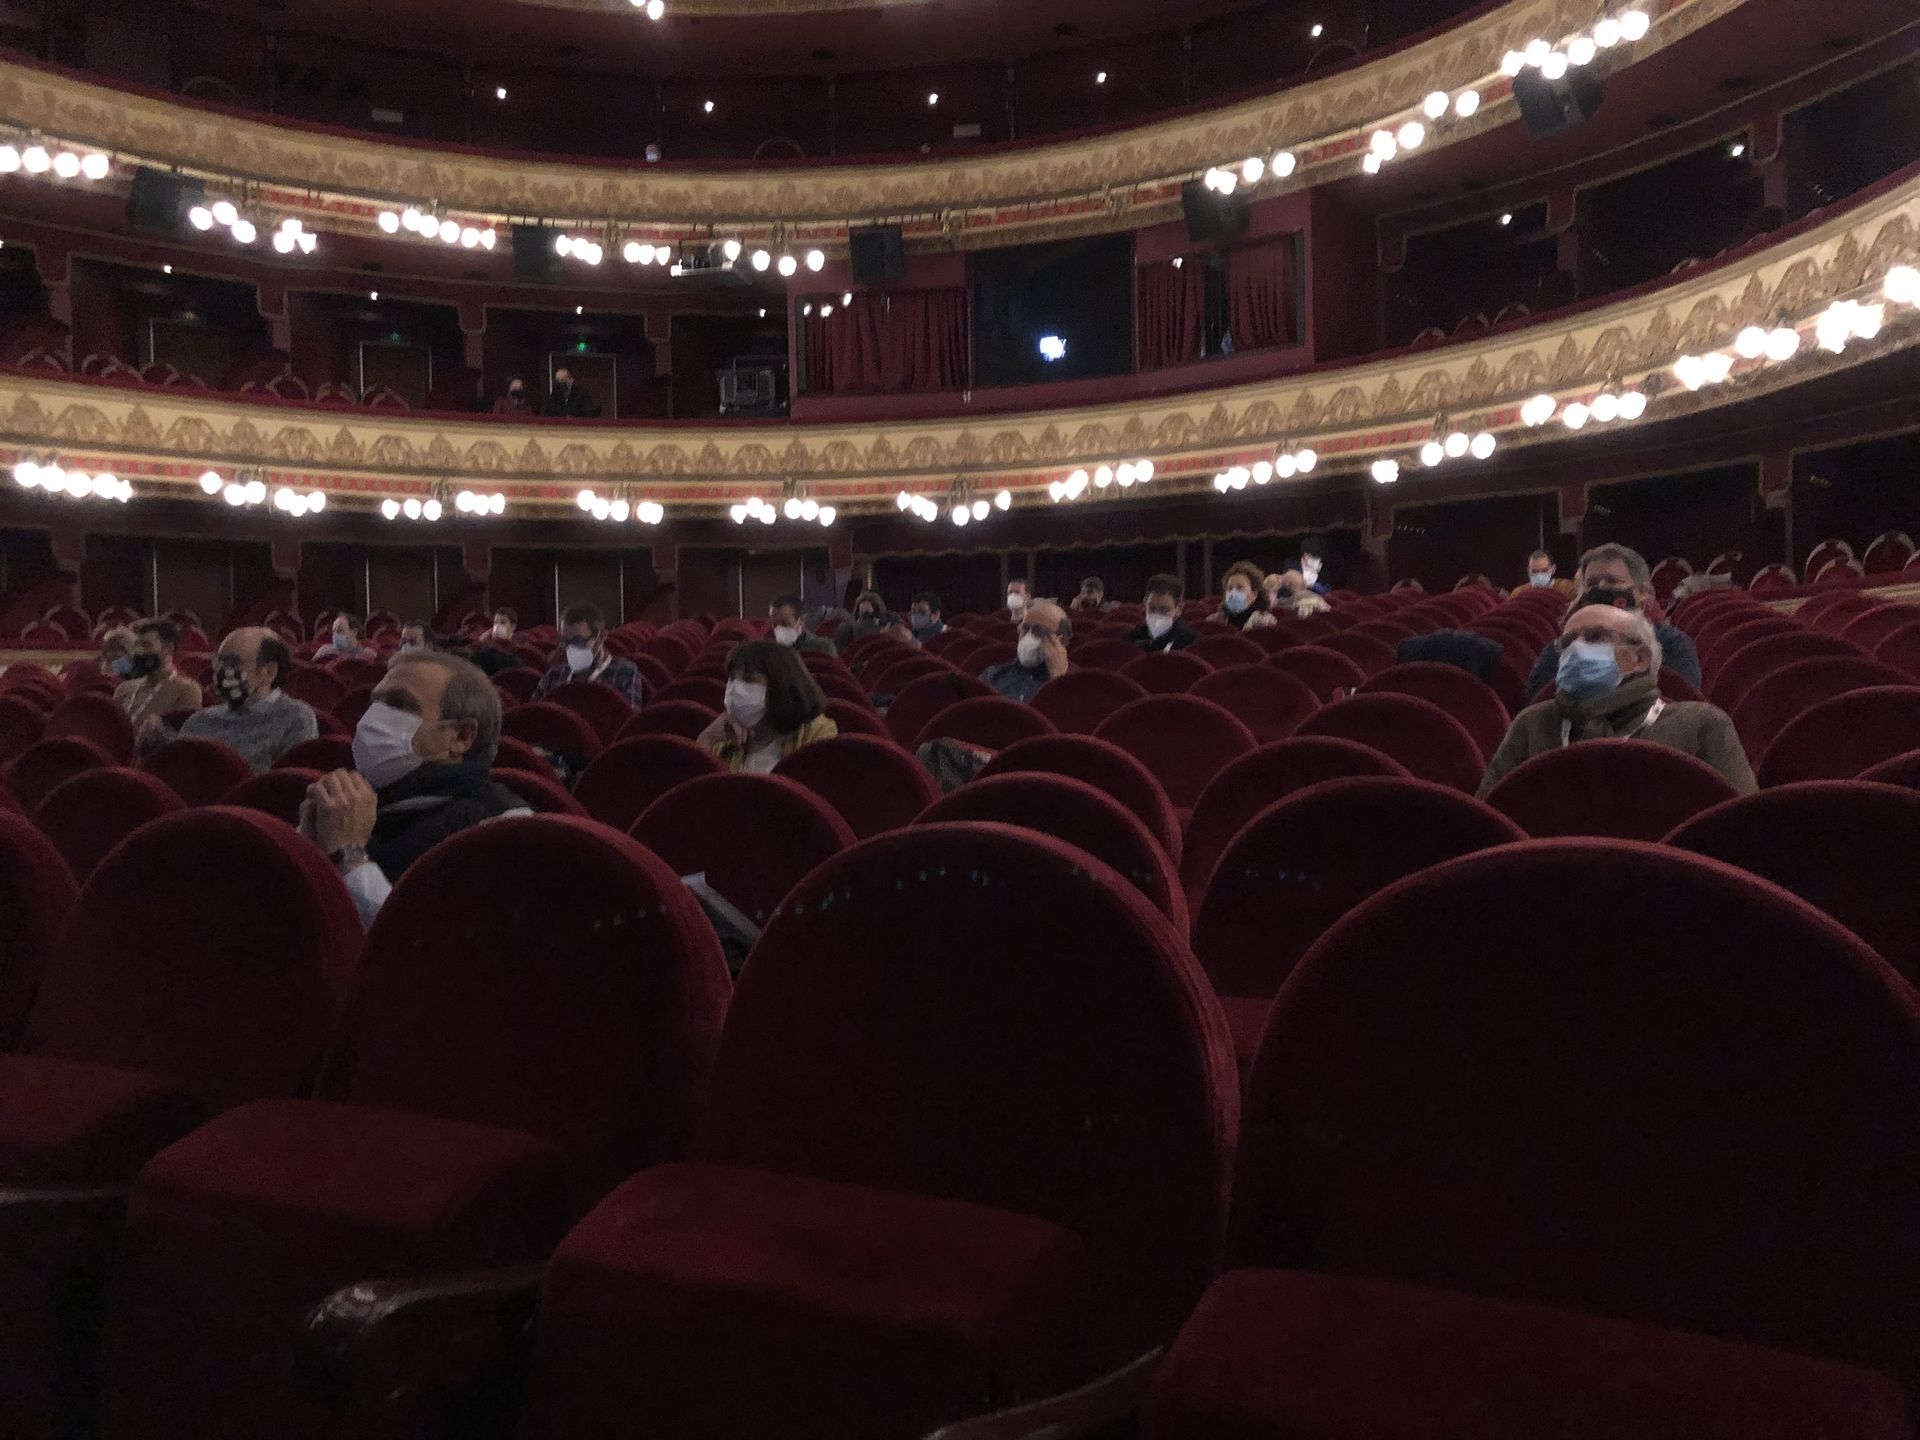 teatro-calderon-valladolid-seminci-covid-coronavirus.jpg